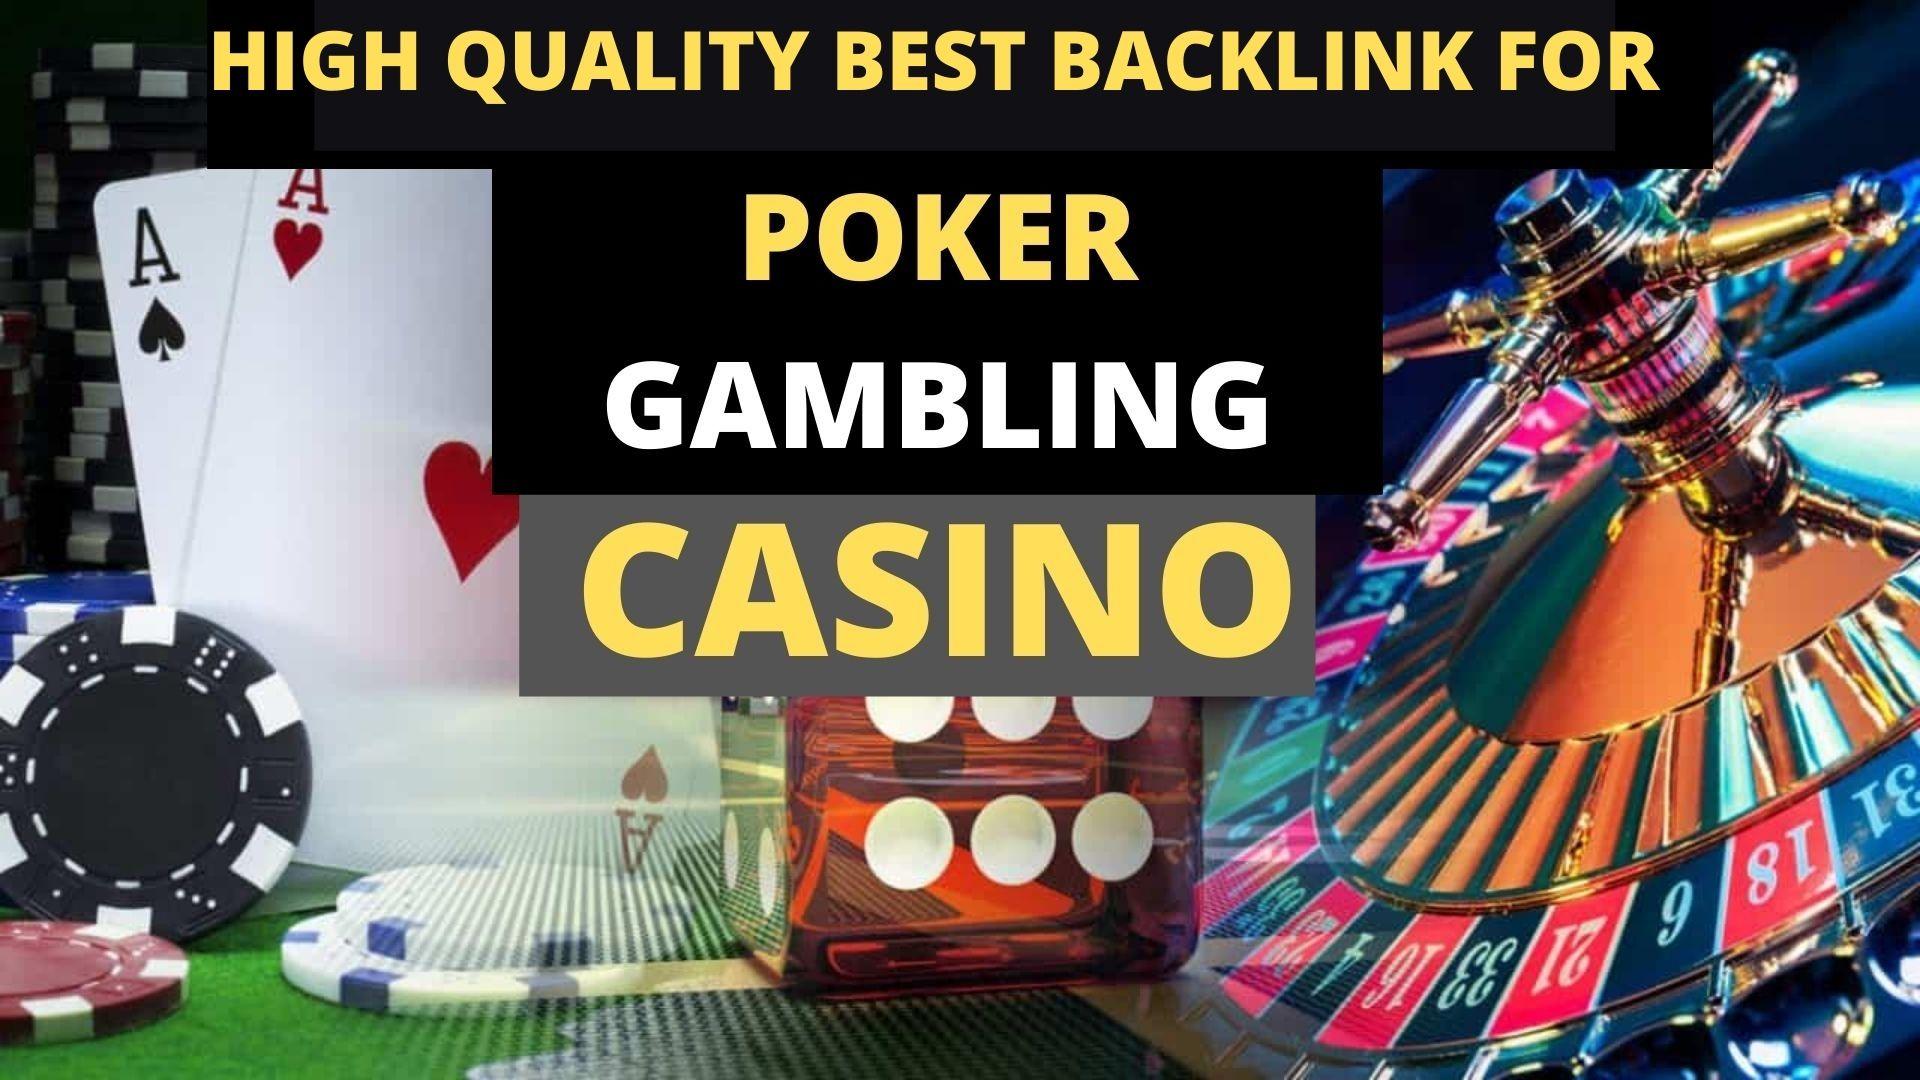 1000+ Casino,  Poker,  Gambling High Quality Pbn Backlinks on high authority sites